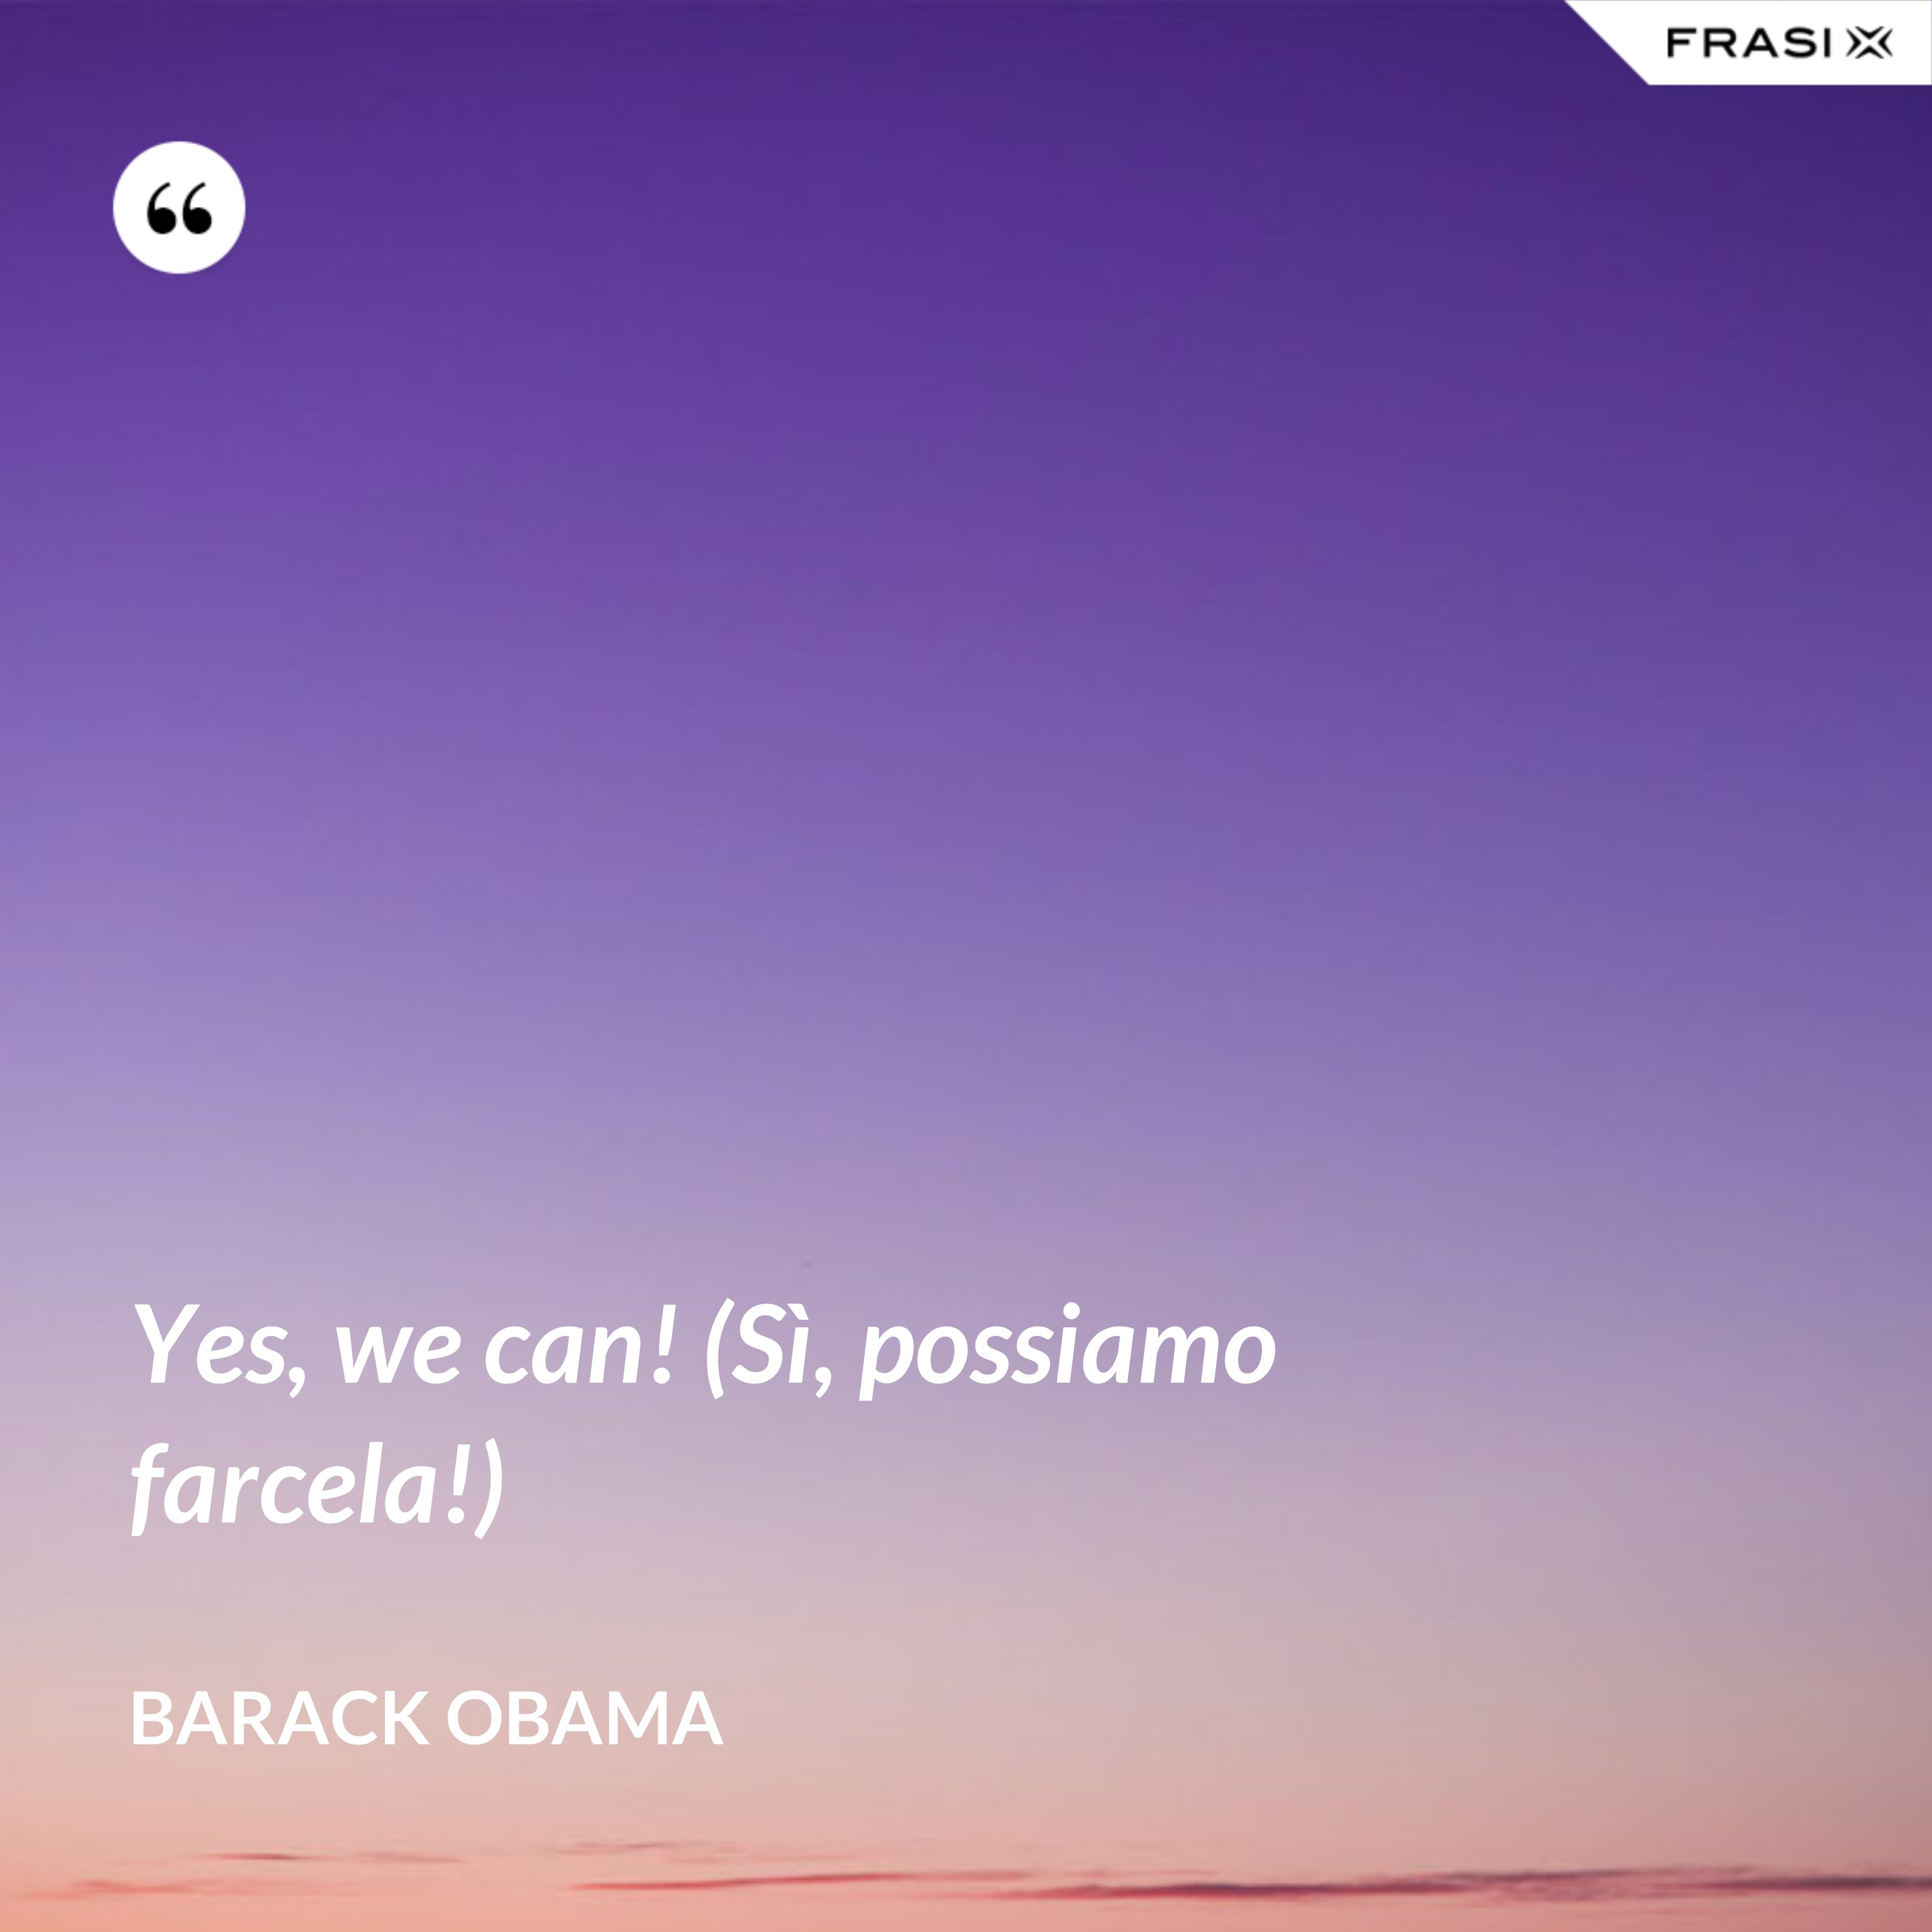 Yes, we can! (Sì, possiamo farcela!) - Barack Obama